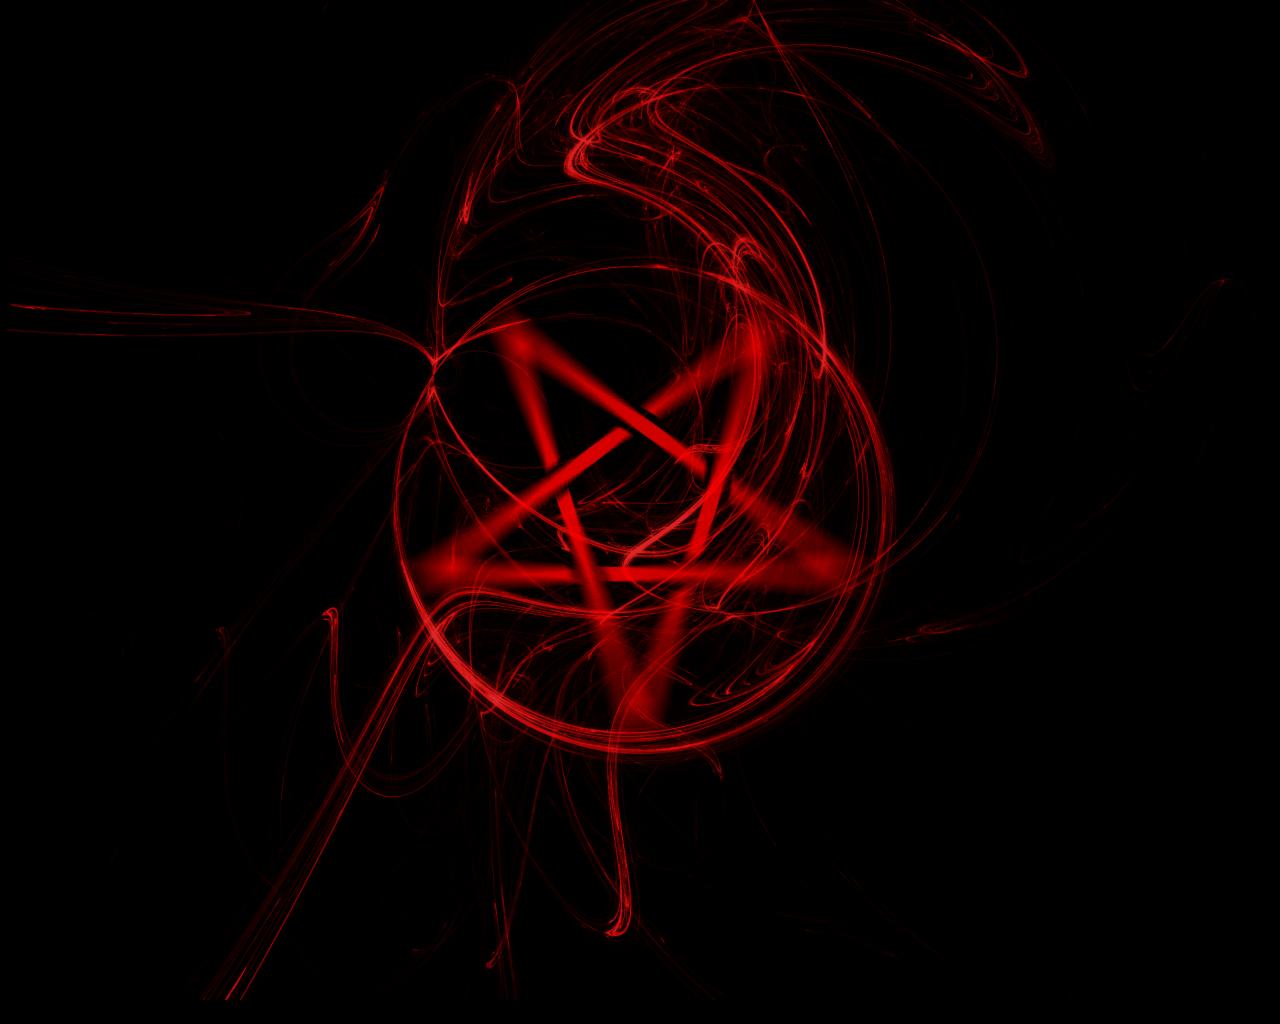 Pentagram Wallpaper 48849 Wallpaper wallpicsize 1280x1024